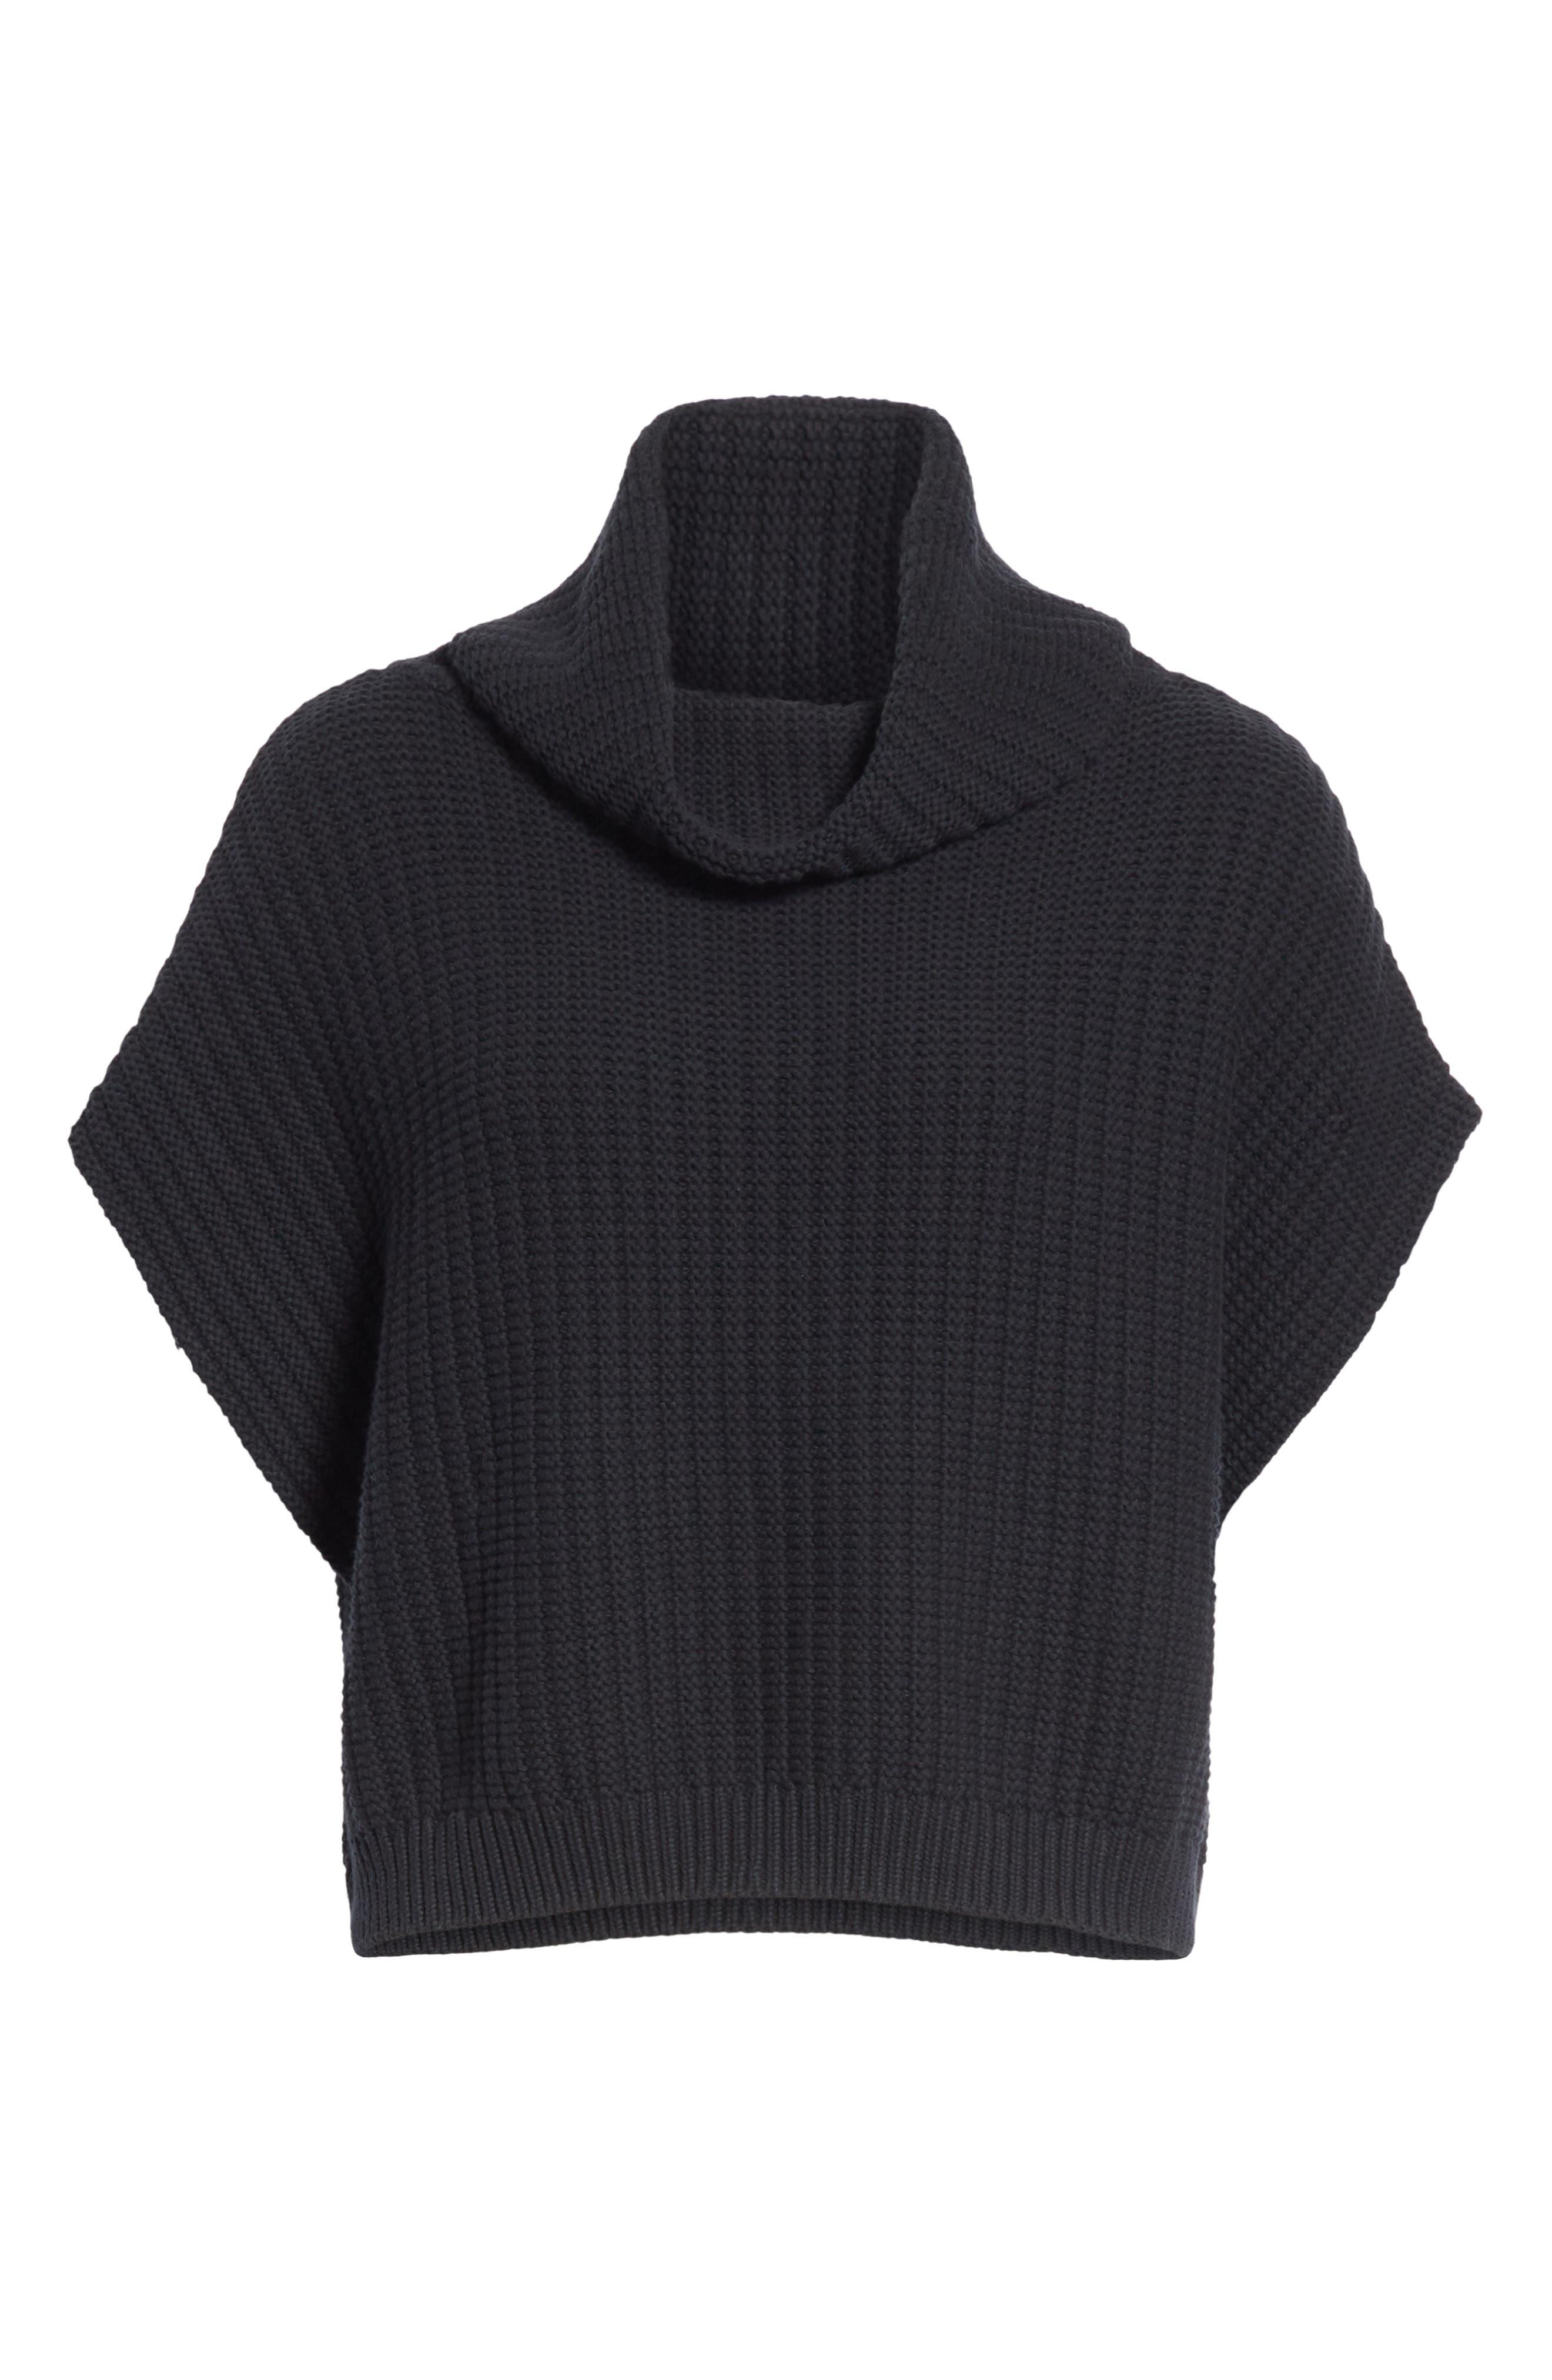 Keep It Simple Vest,                             Alternate thumbnail 6, color,                             001